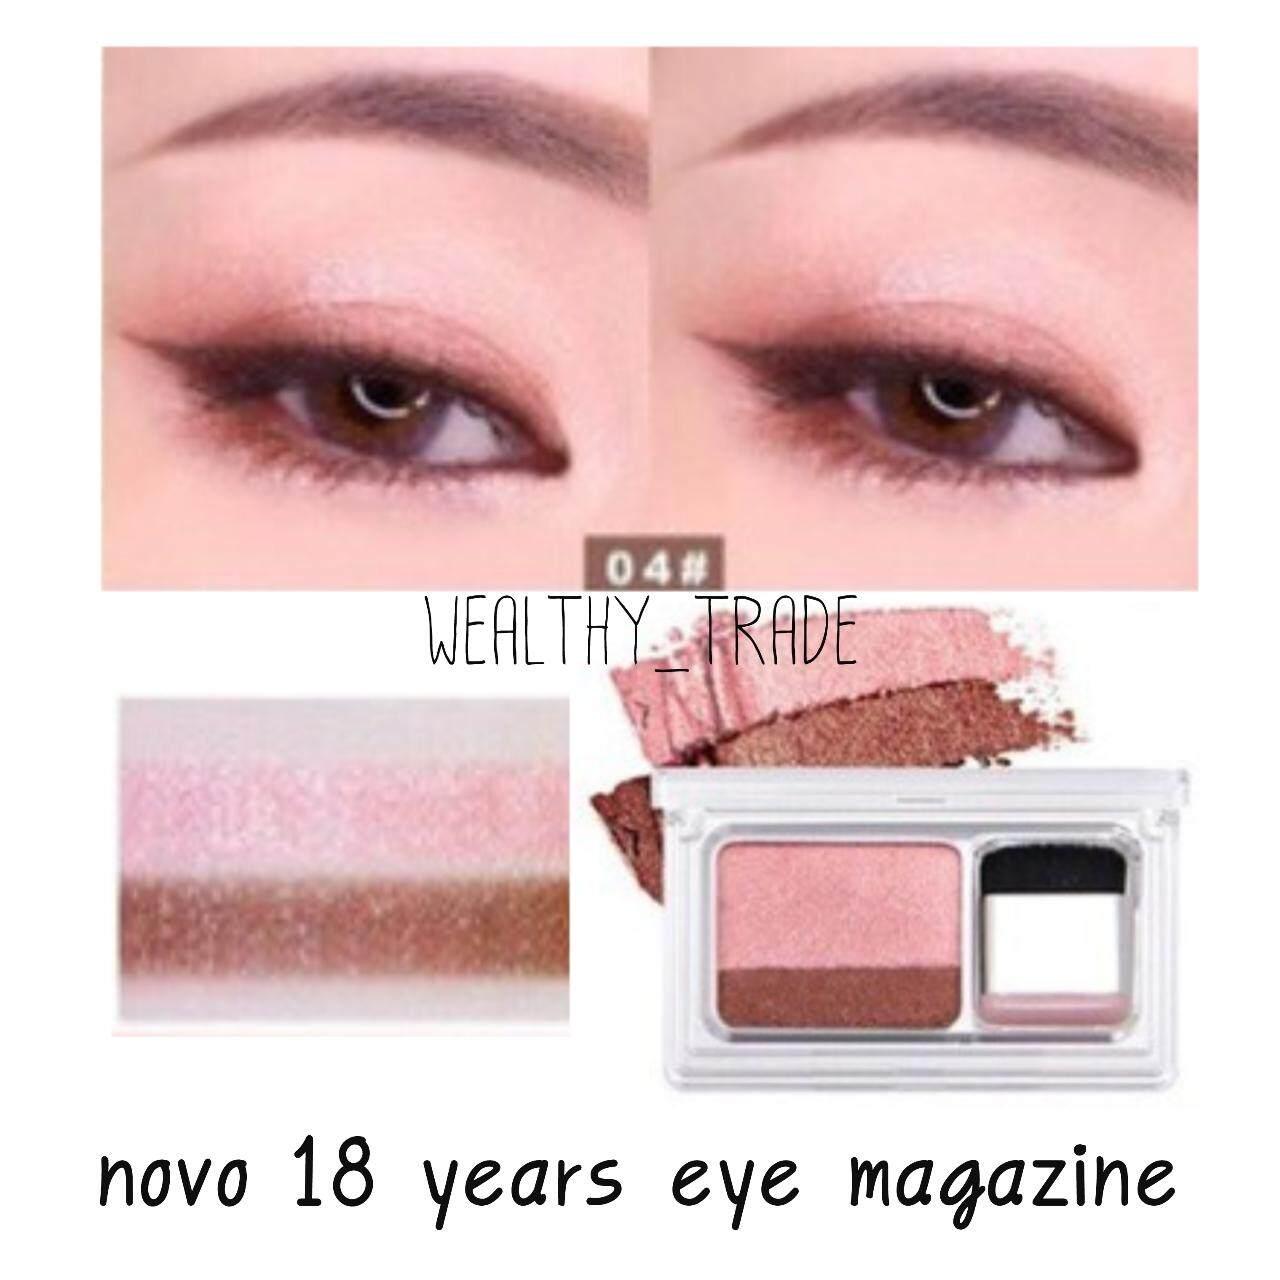 Novo Eye Shadow ของแท้ 100% (no.4 เบอร์ยอดฮิตที่ขายดีที่สุด) Novo 18 Years Eye Magazine โนโวอายแชโดว์รุ่นใหม่ล่าสุด สไตล์สาวเกาหลี มี 2 สีในตลับเดียวกัน ปาดทีเดียวอยู่ กันน้ำ ติดทน มีทั้งเนื้อแมทและชิมเมอร์ให้เลือกตามใจชอบ แบรนด์นี้ไม่เคยทำให้ผิดหวัง.